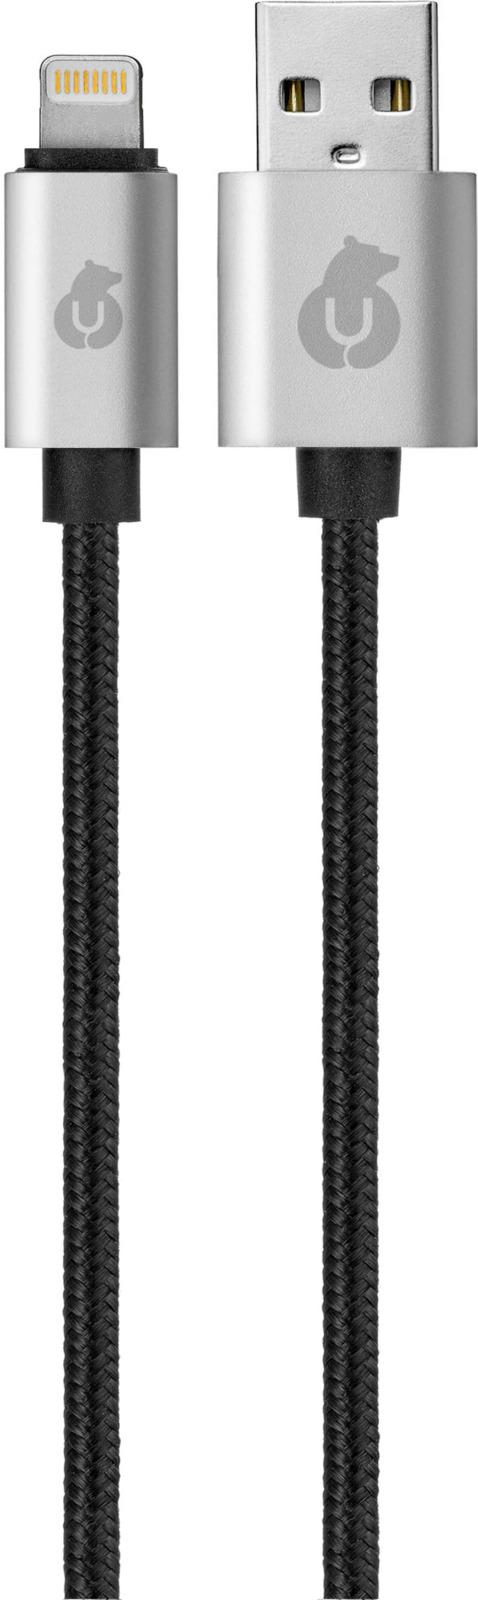 uBear Lightning-USB, Black кабель Apple Lightning цена